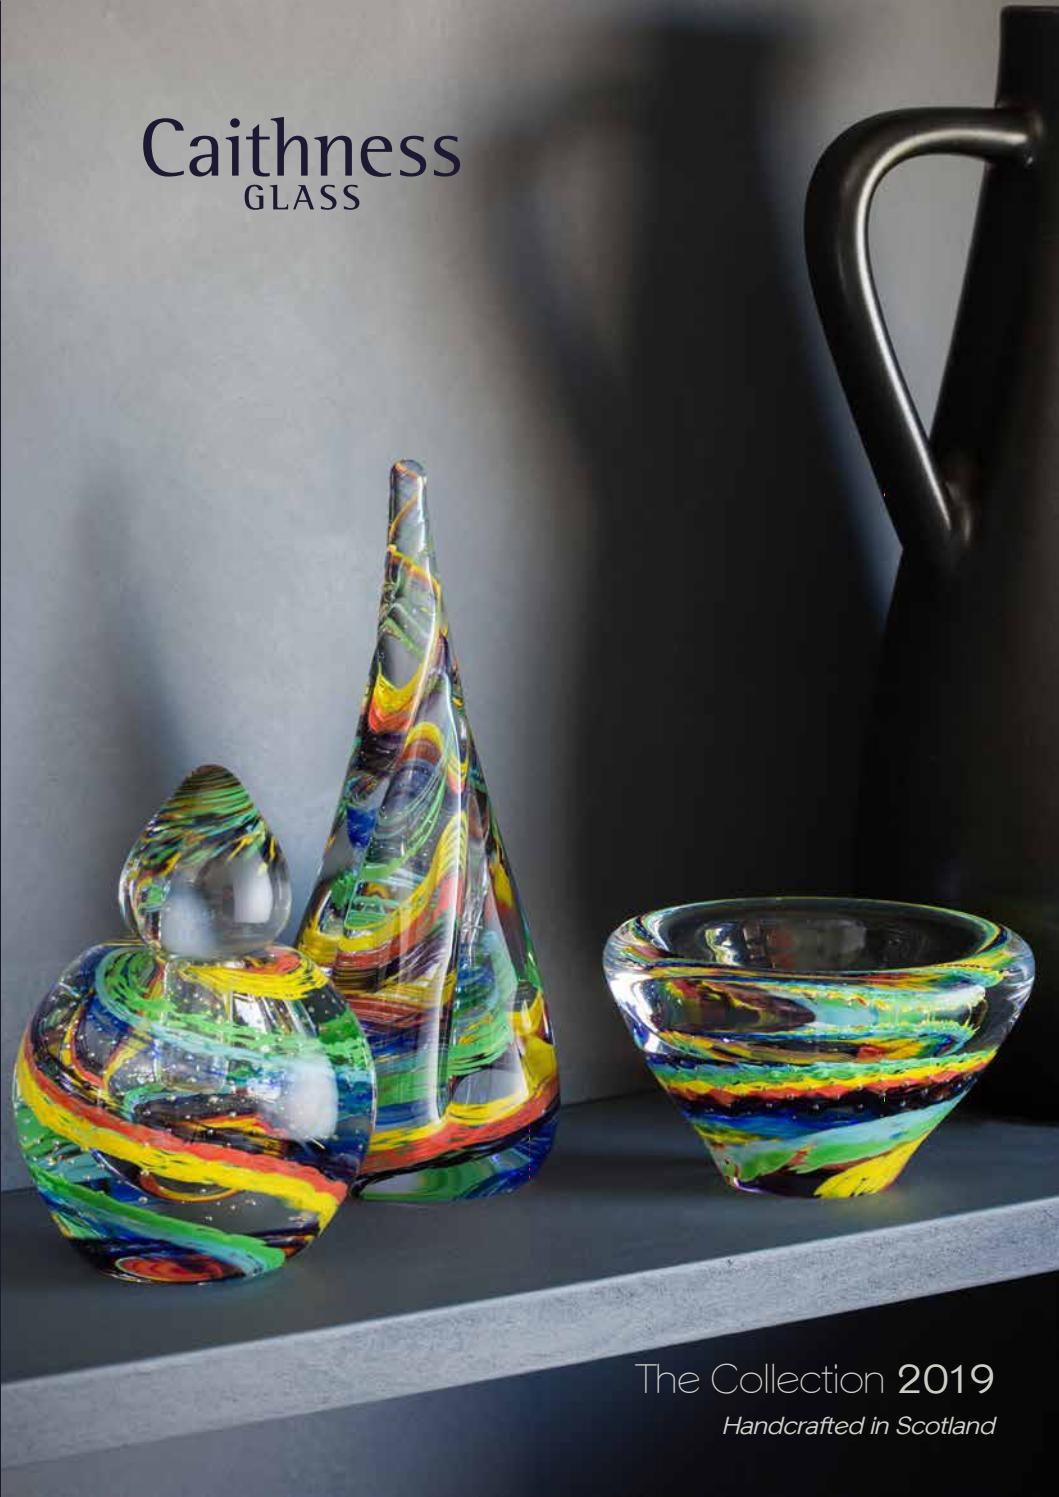 Caithness Glass U18032 Landmarks Golden Sunrise Stonehenge Paperweight